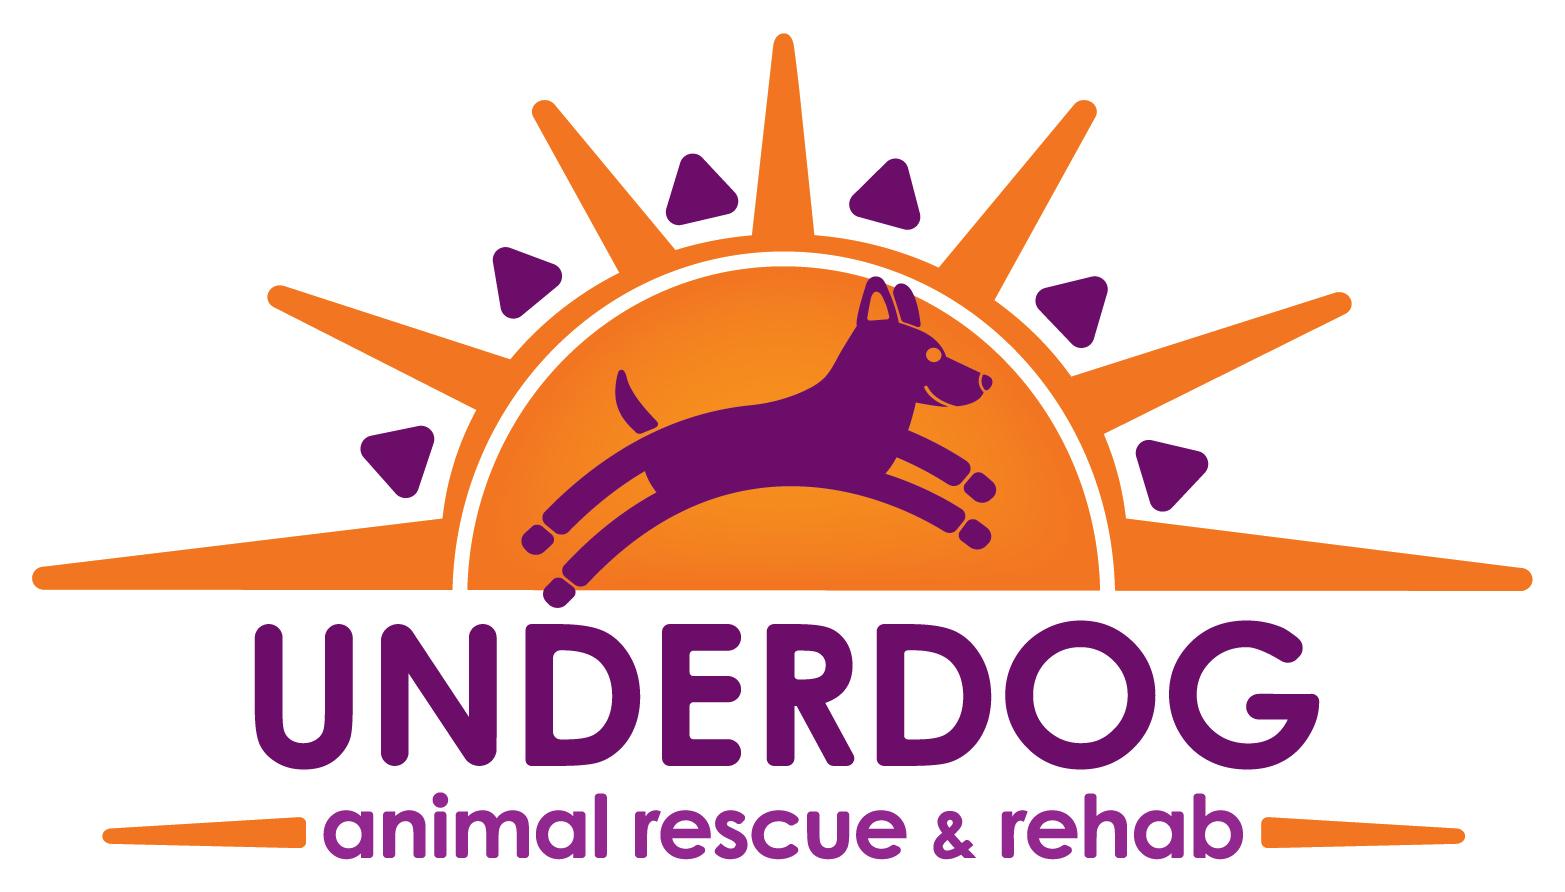 Underdog Animal Rescue and Rehab